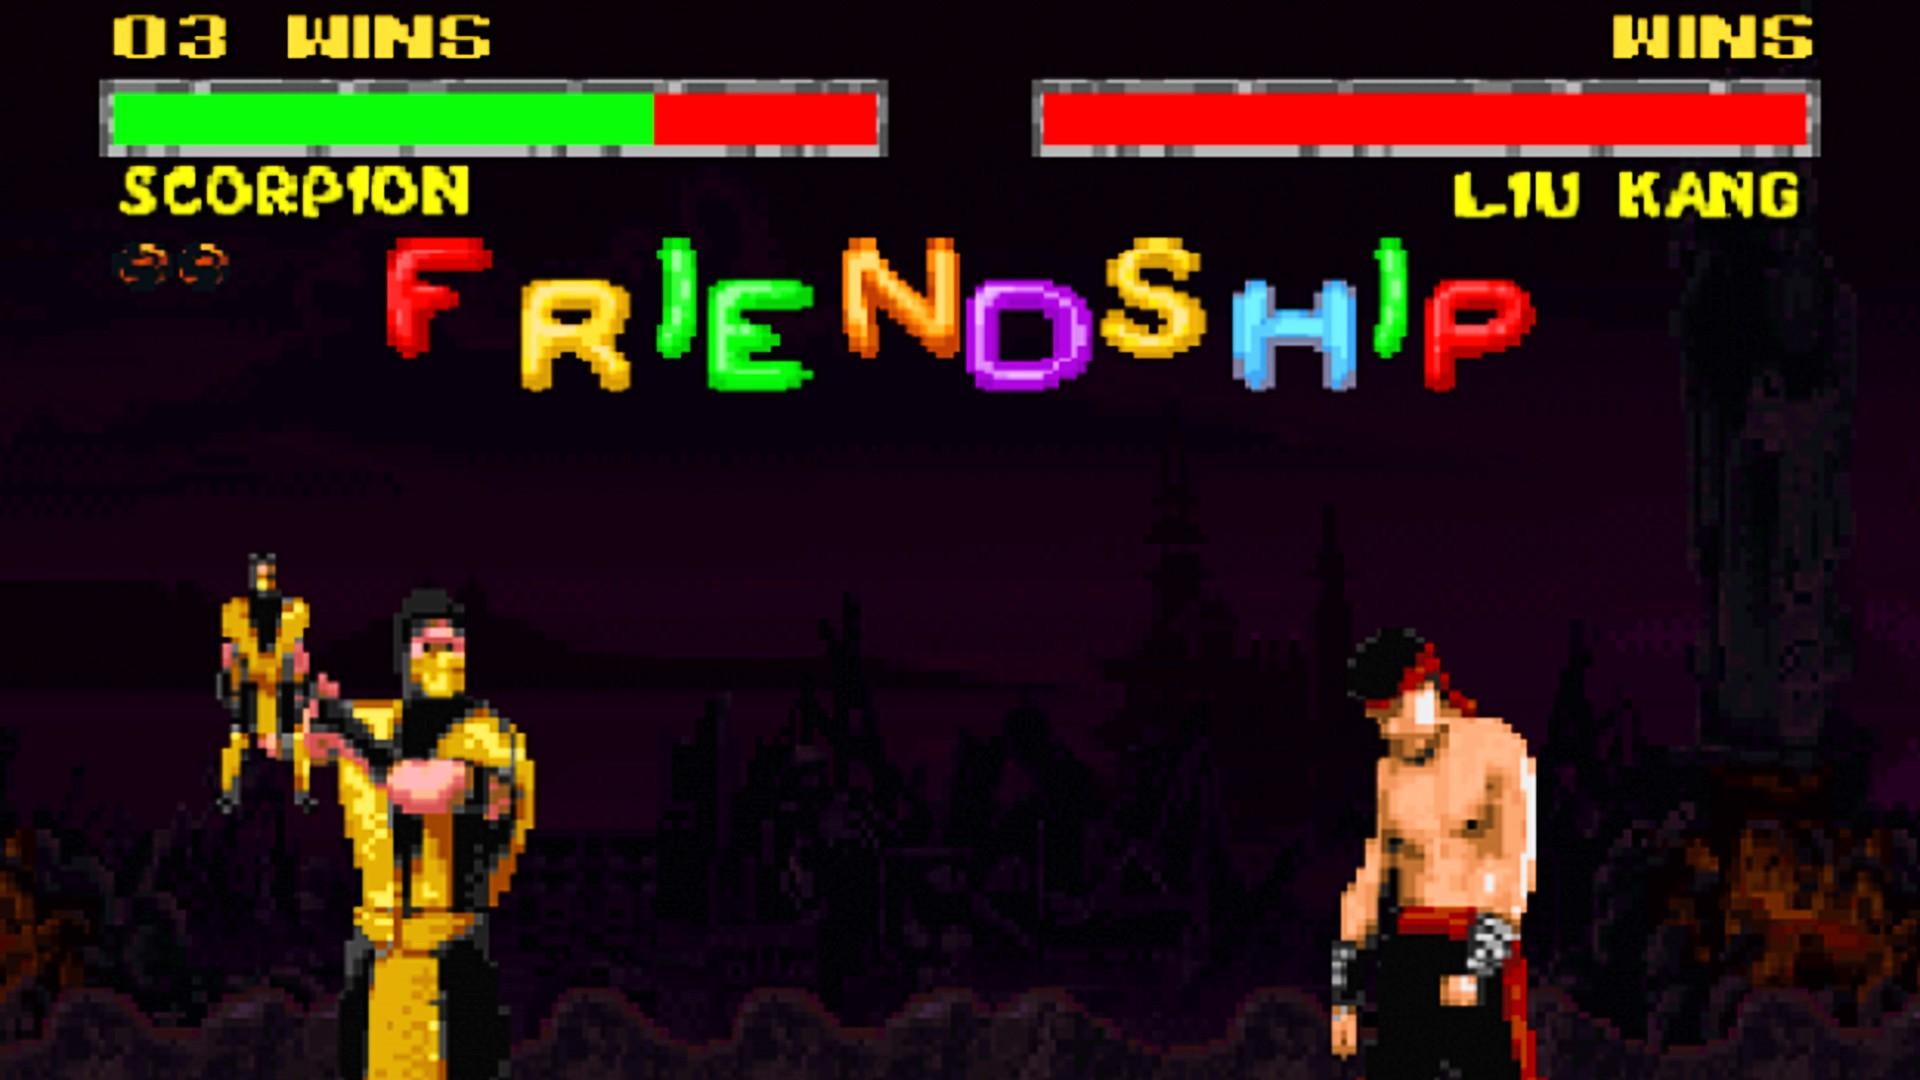 This Doom mod lets you play Mortal Kombat 2